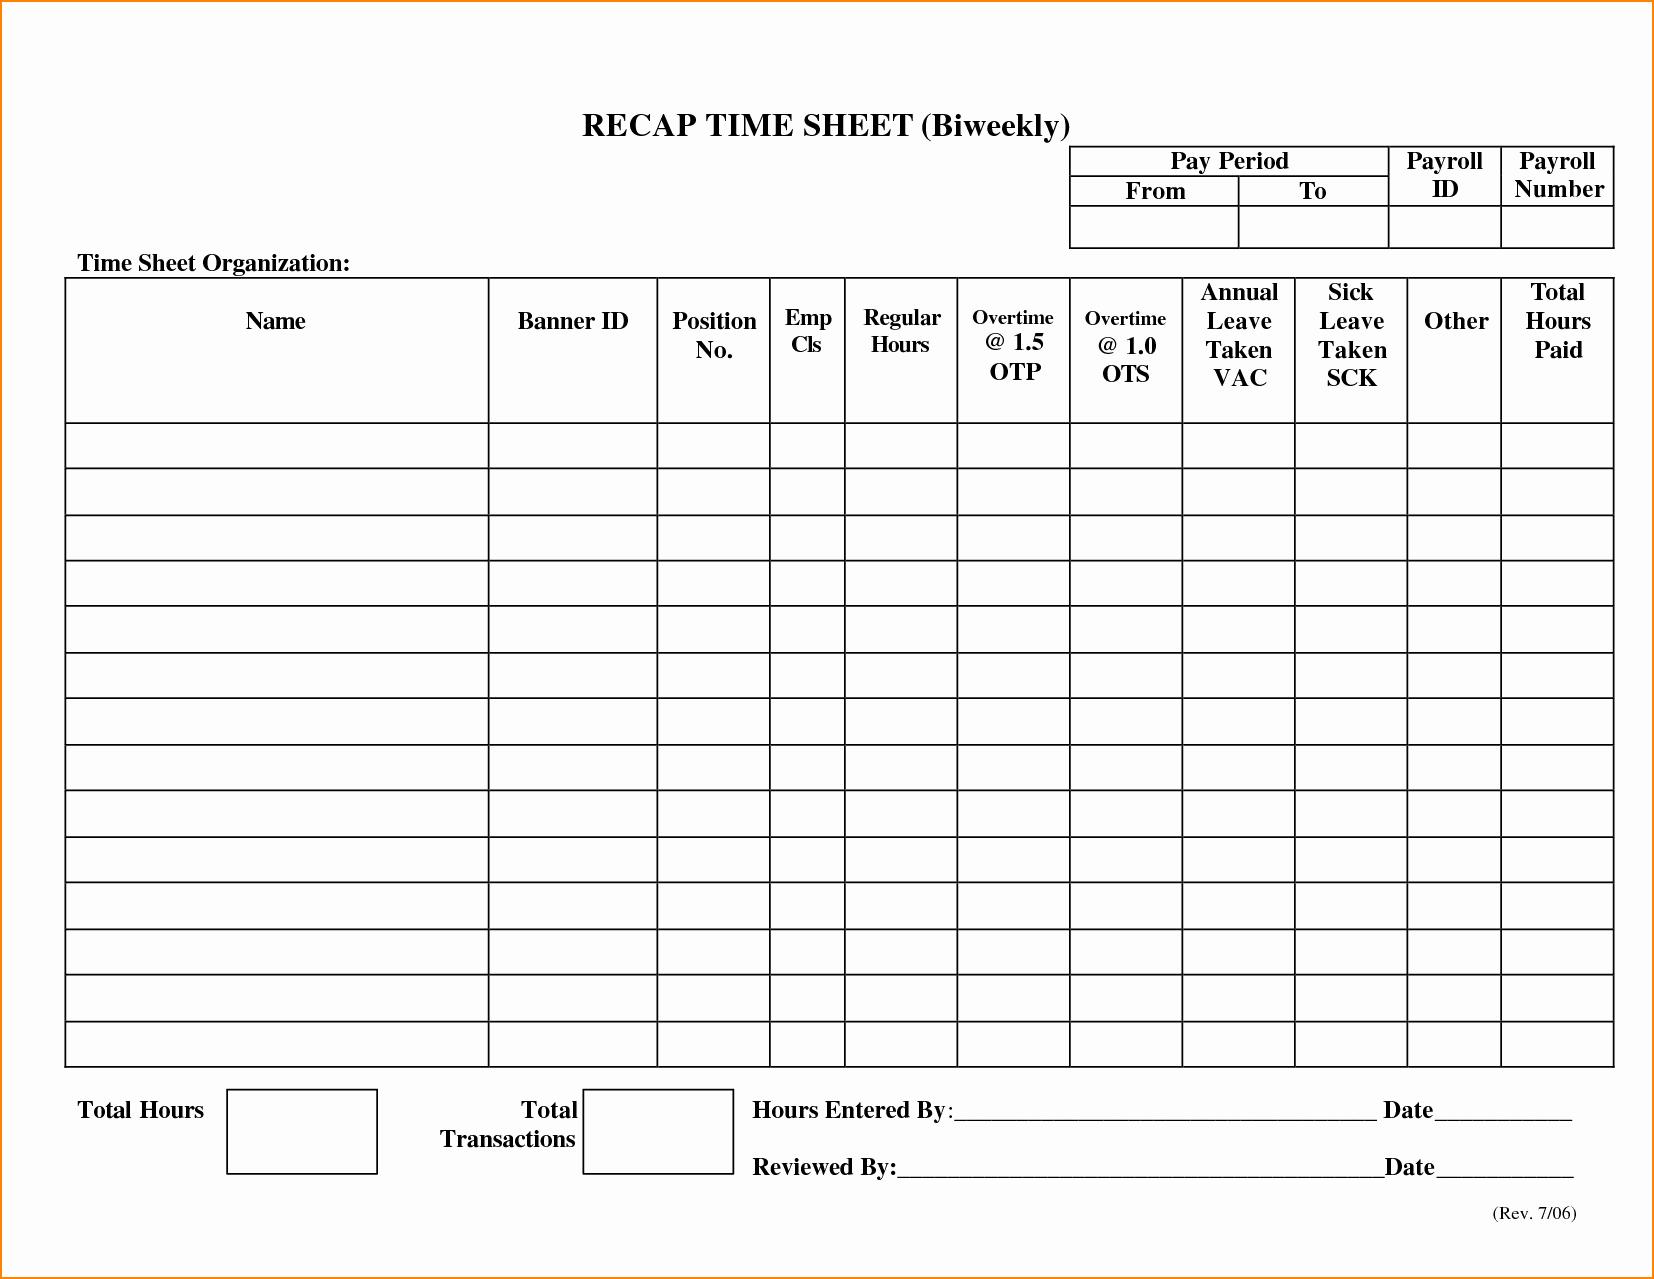 Employee Sign In Sheet Template Best Of 5 Payroll Sign Off Sheet